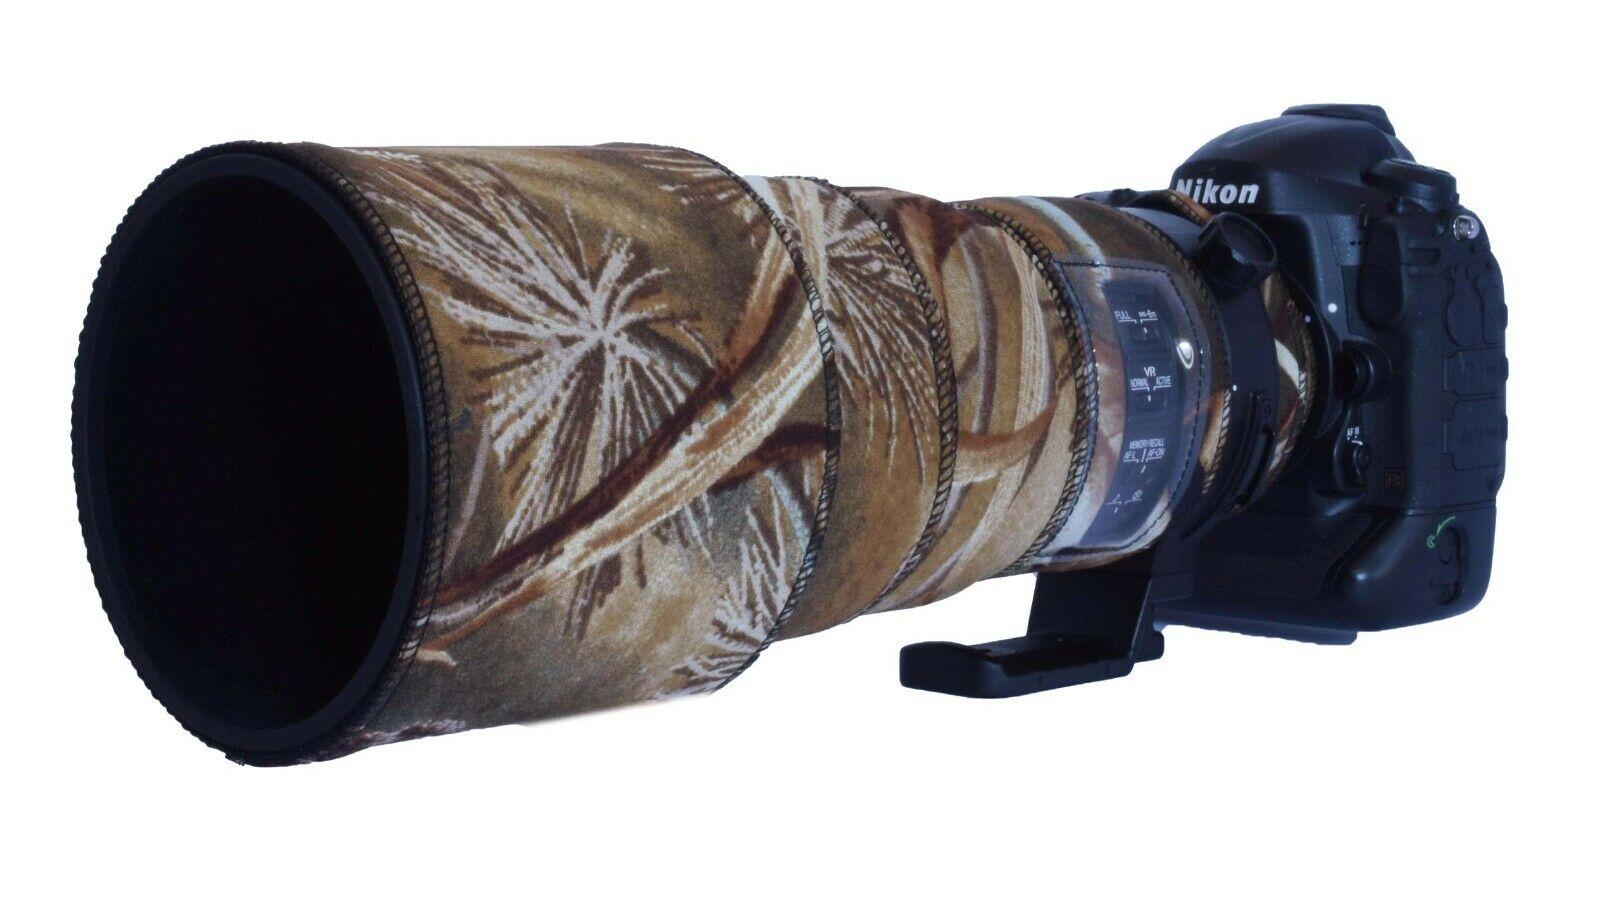 Nikon 300mm f2.8 ED VR1/II Neoprene lens protection Premium range